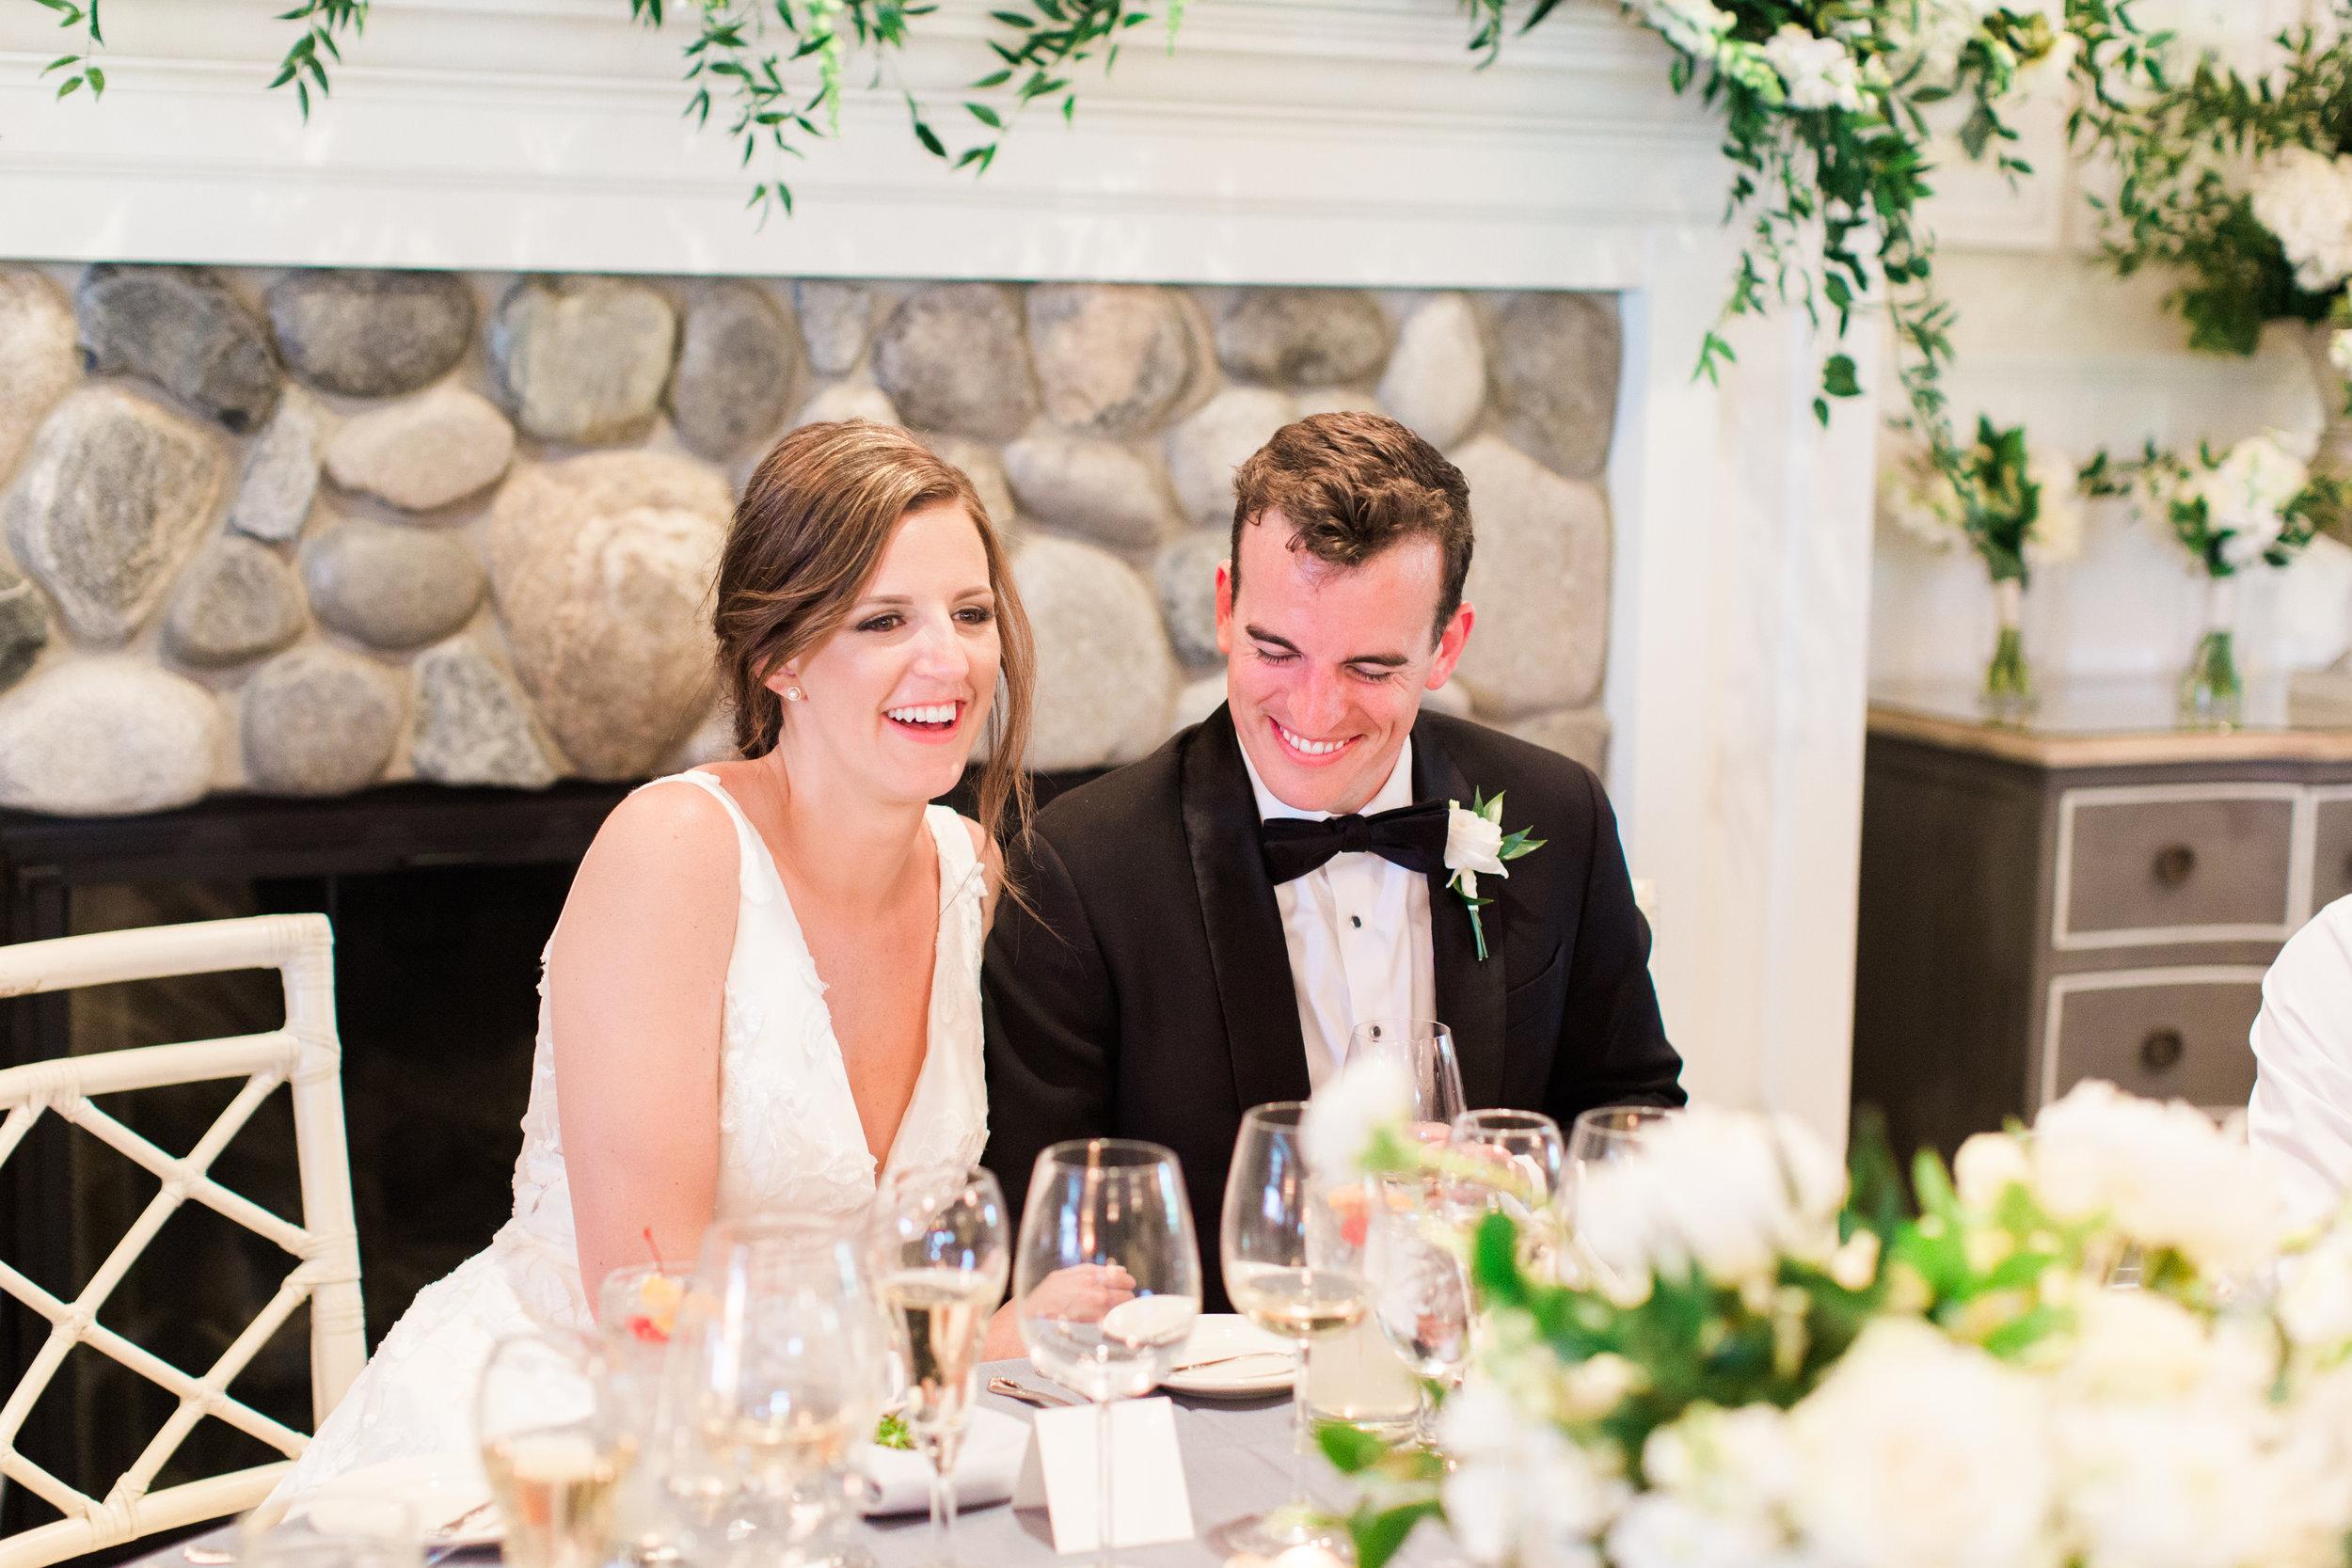 DeGuilio+Wedding+Reception-80.jpg